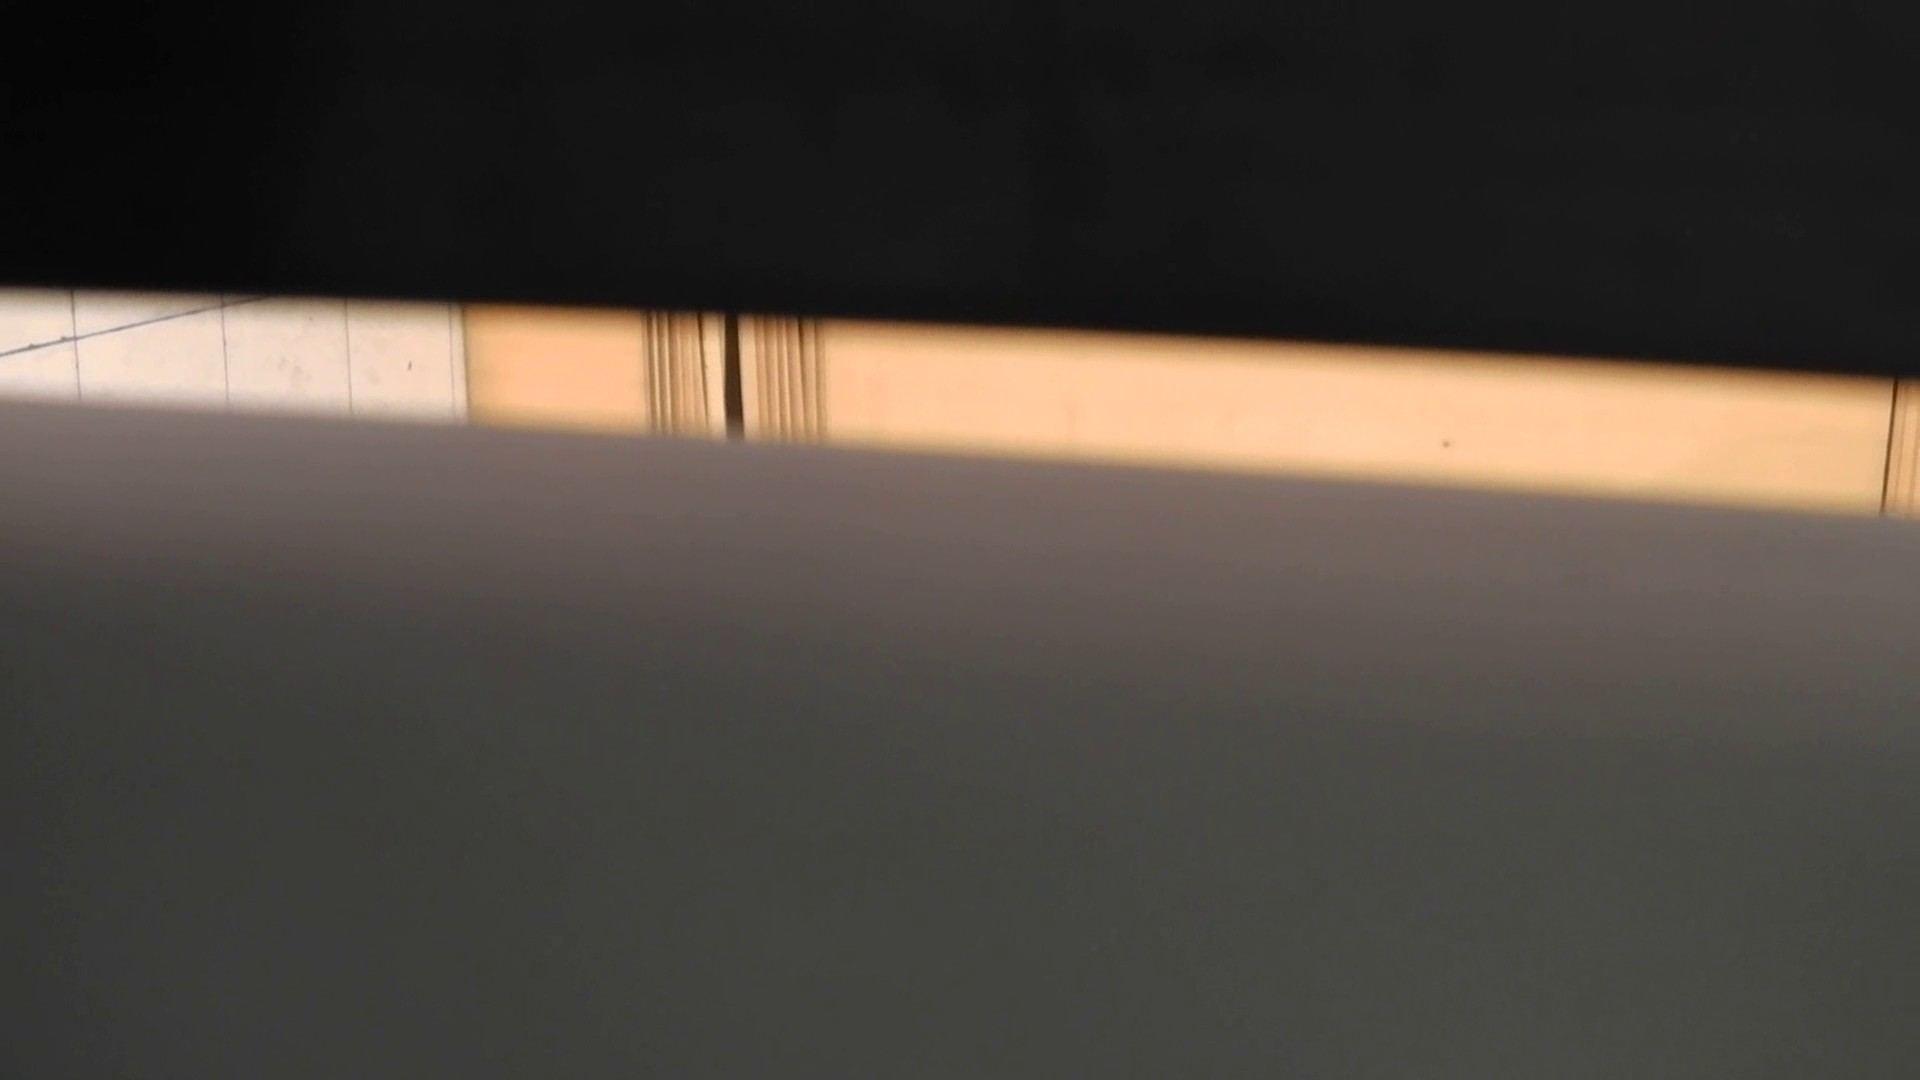 vol.25三十時間潜り、一つしか出会えない完璧桃尻編 byお銀 洗面所   OLの実態  92pic 43